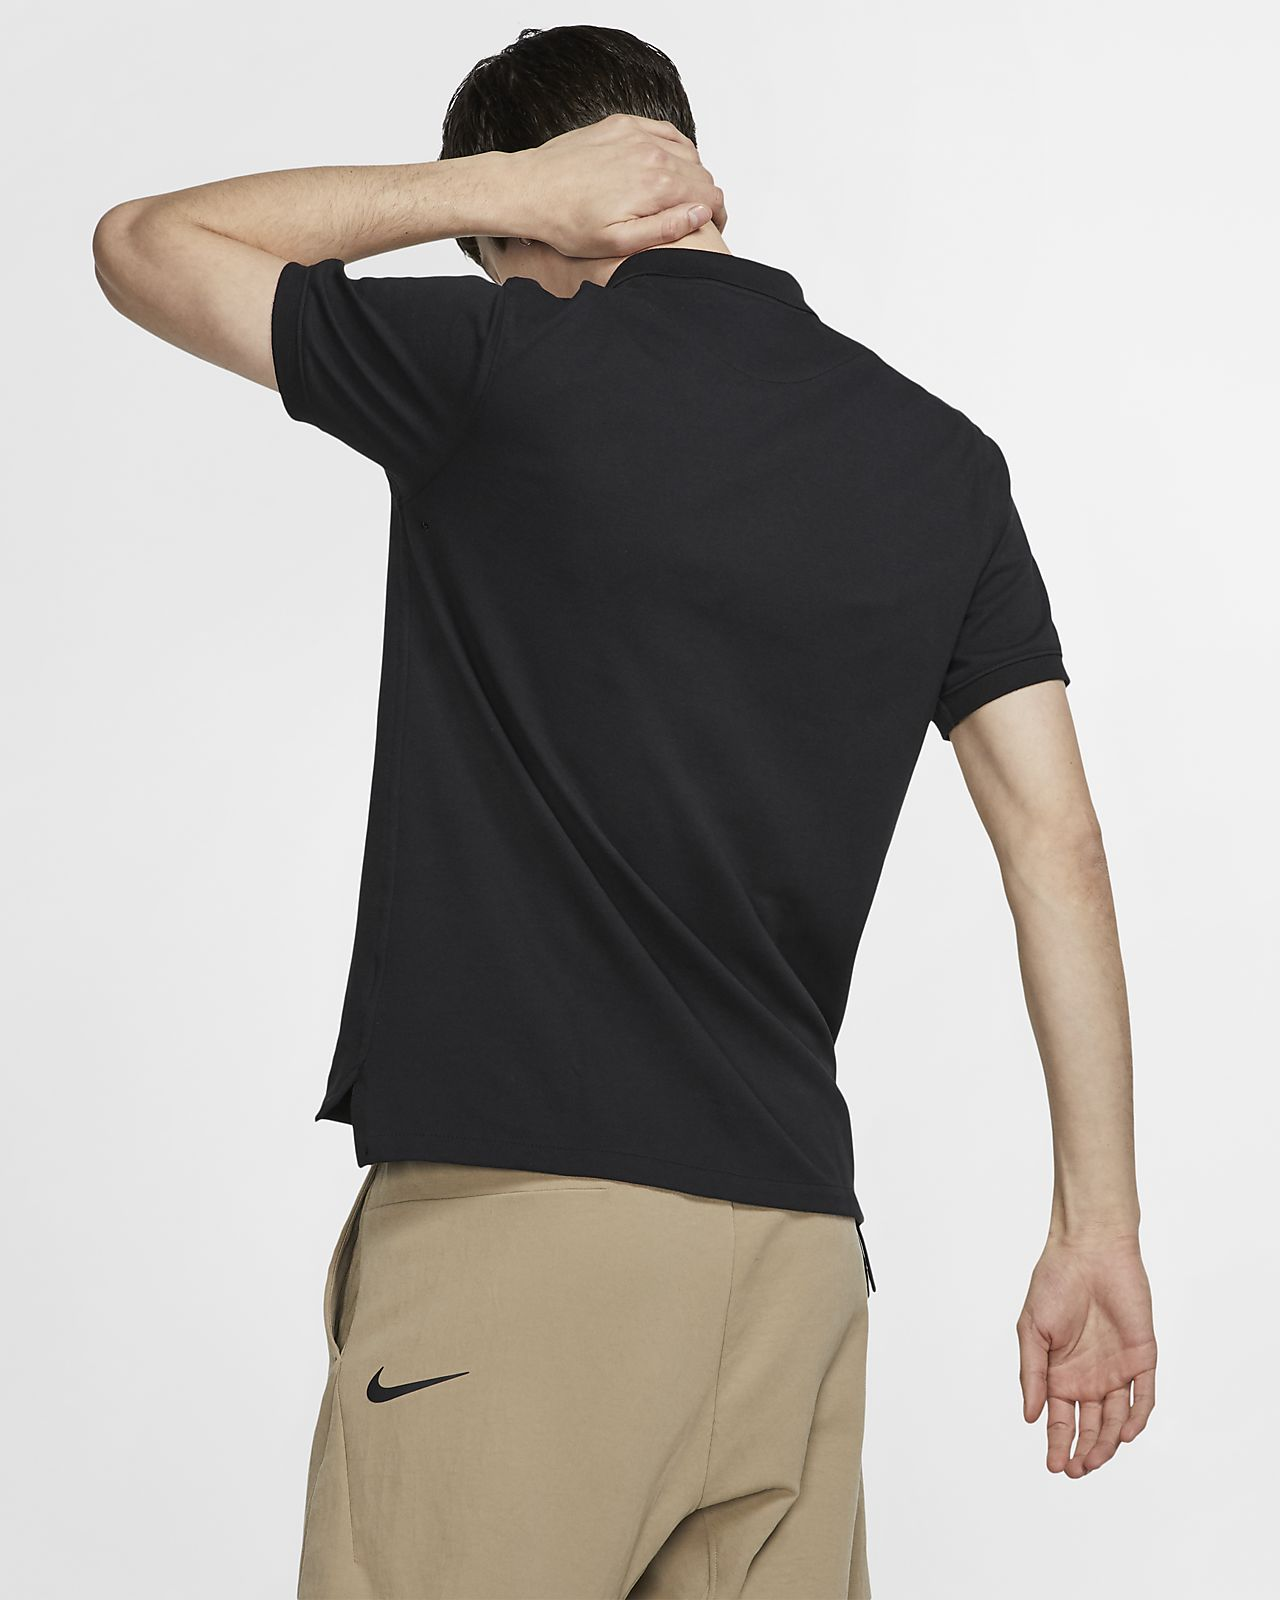 18e3fe49 The Nike Polo Unisex Slim Fit Polo. Nike.com CA